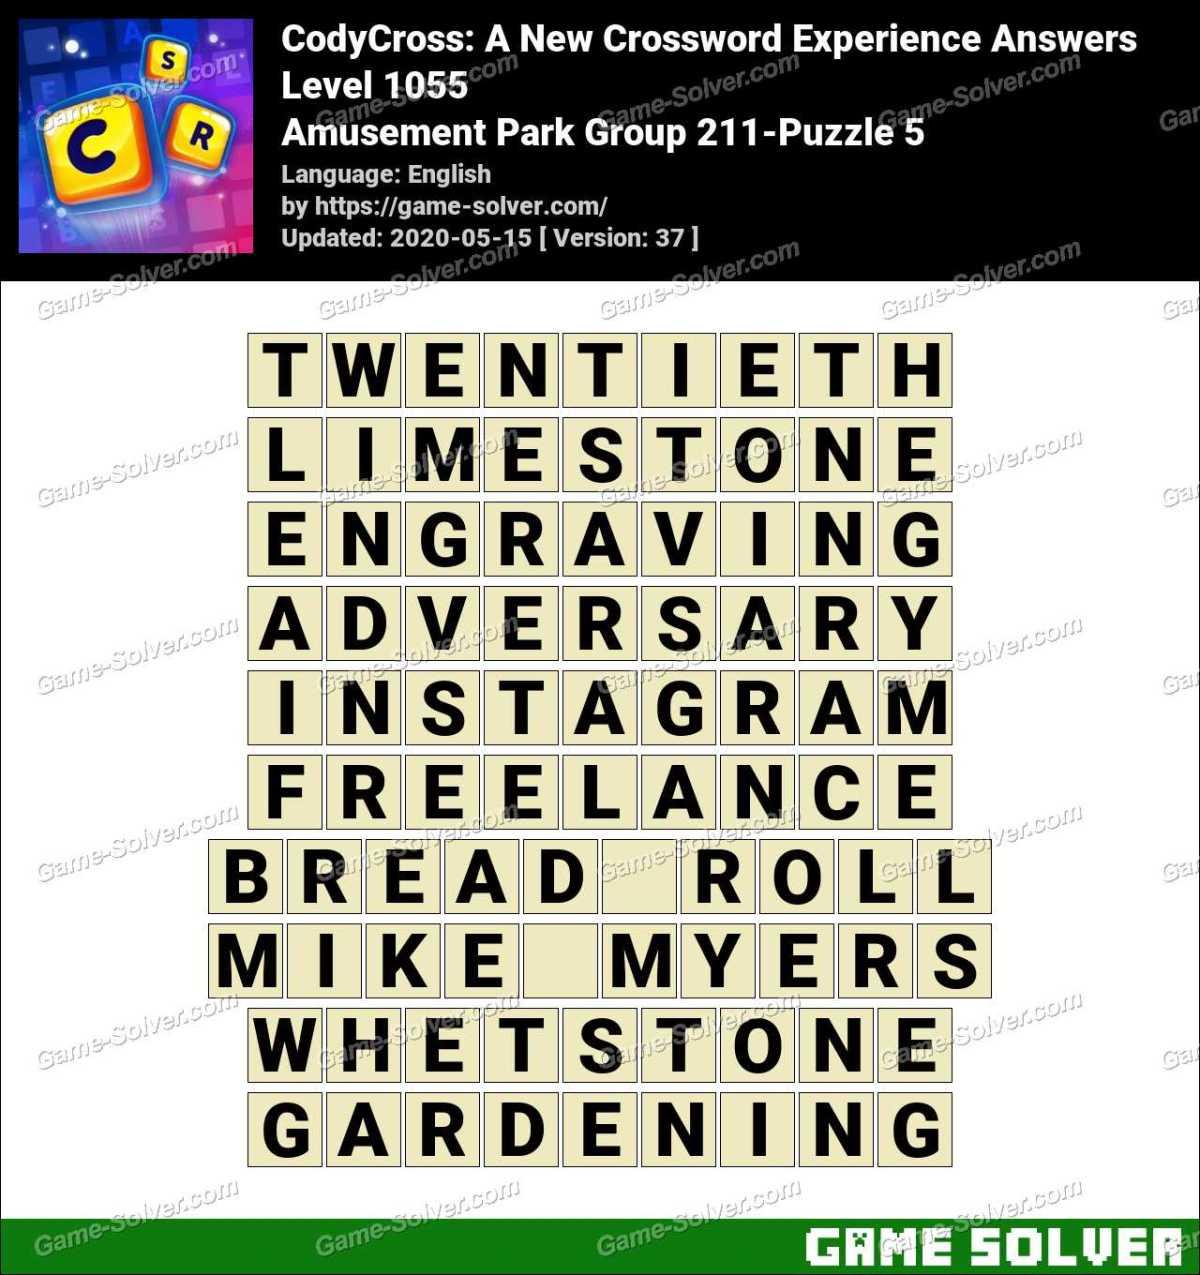 CodyCross Amusement Park Group 211-Puzzle 5 Answers